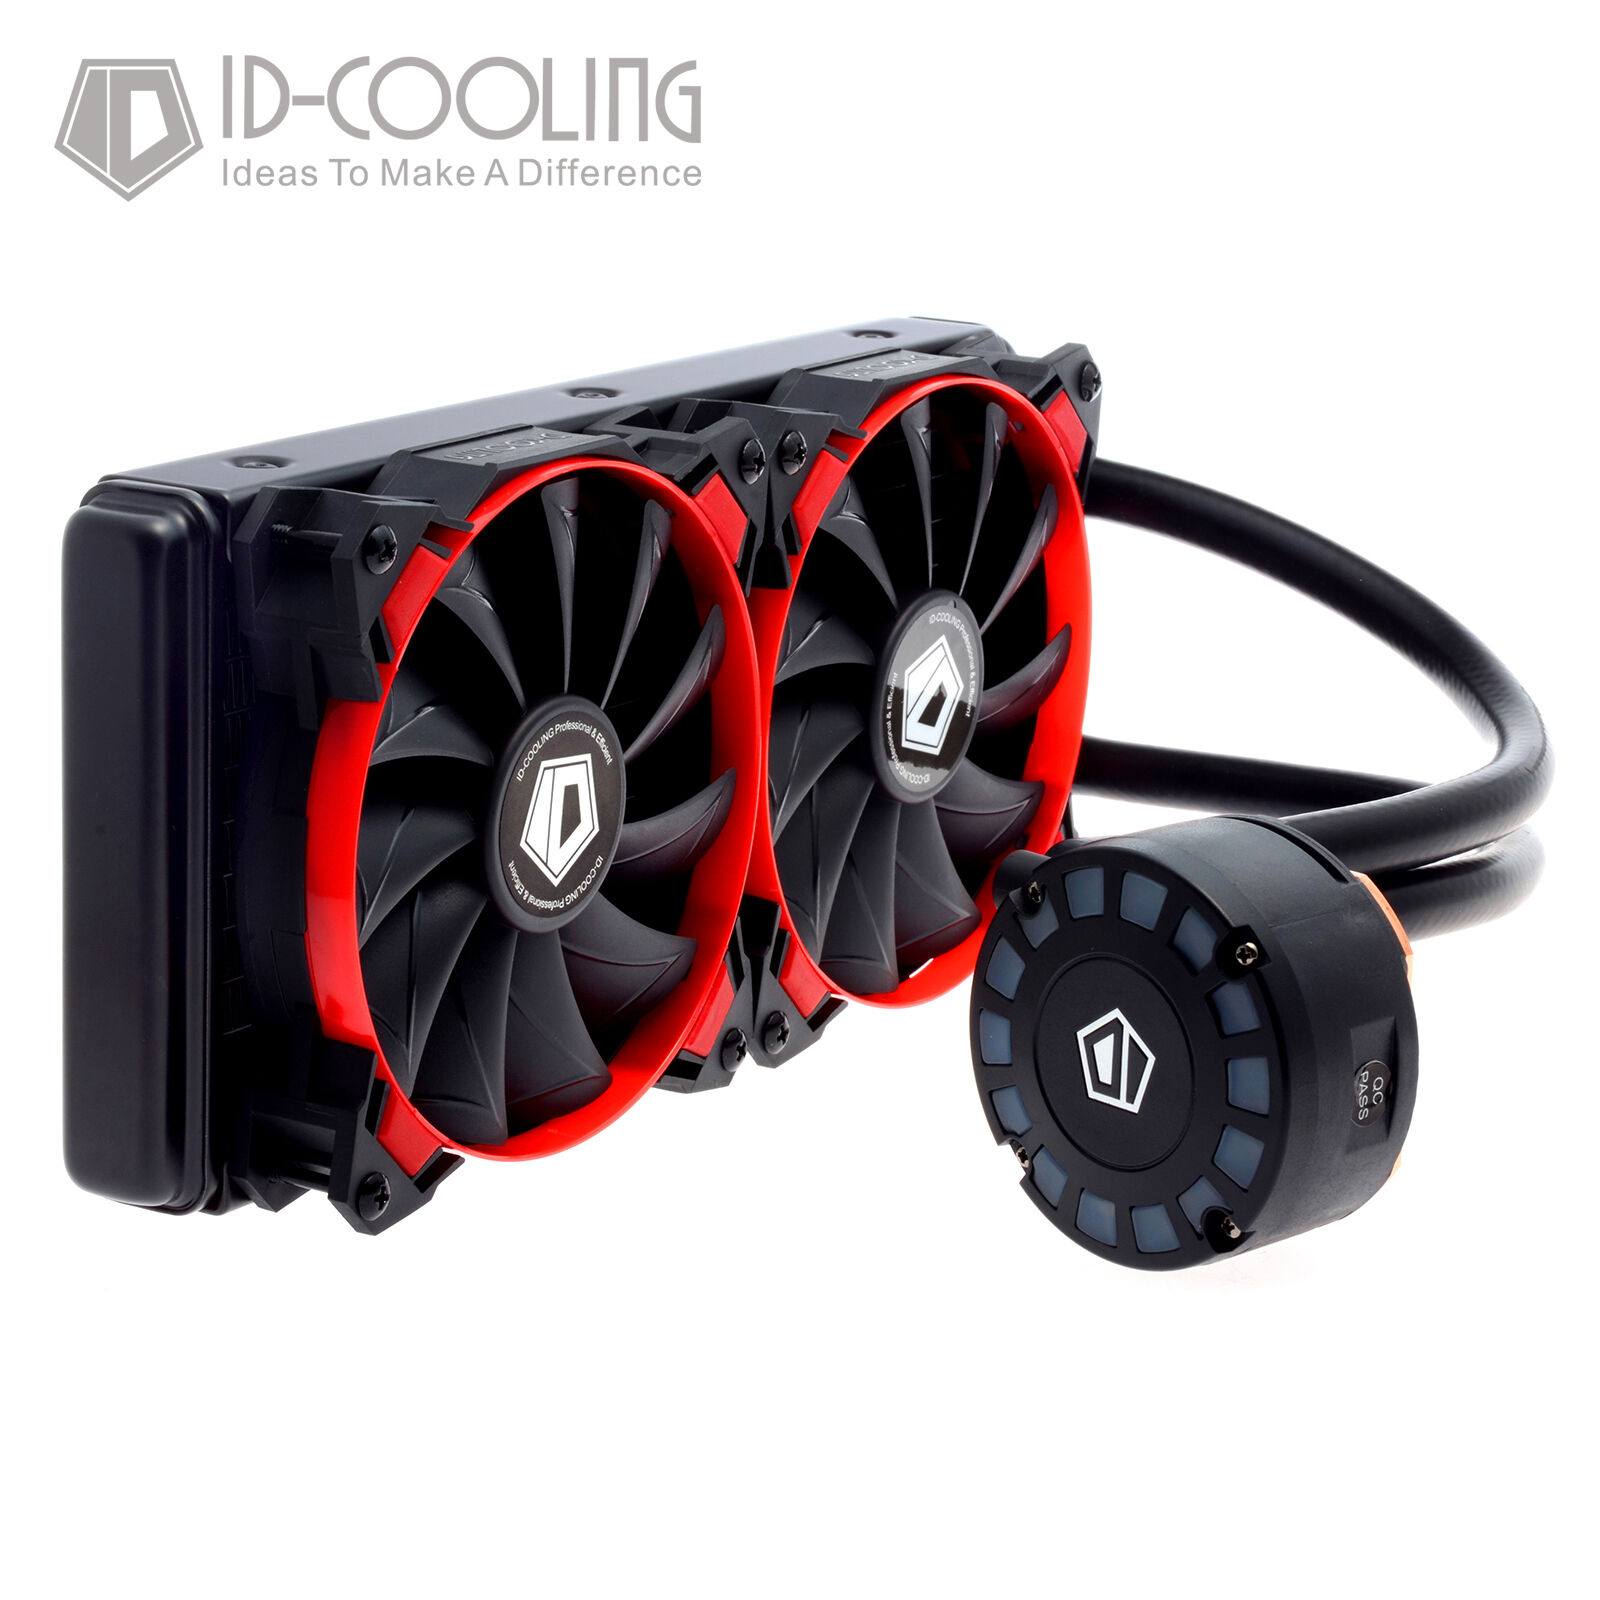 Best Liquid CPU Coolers S-l1600